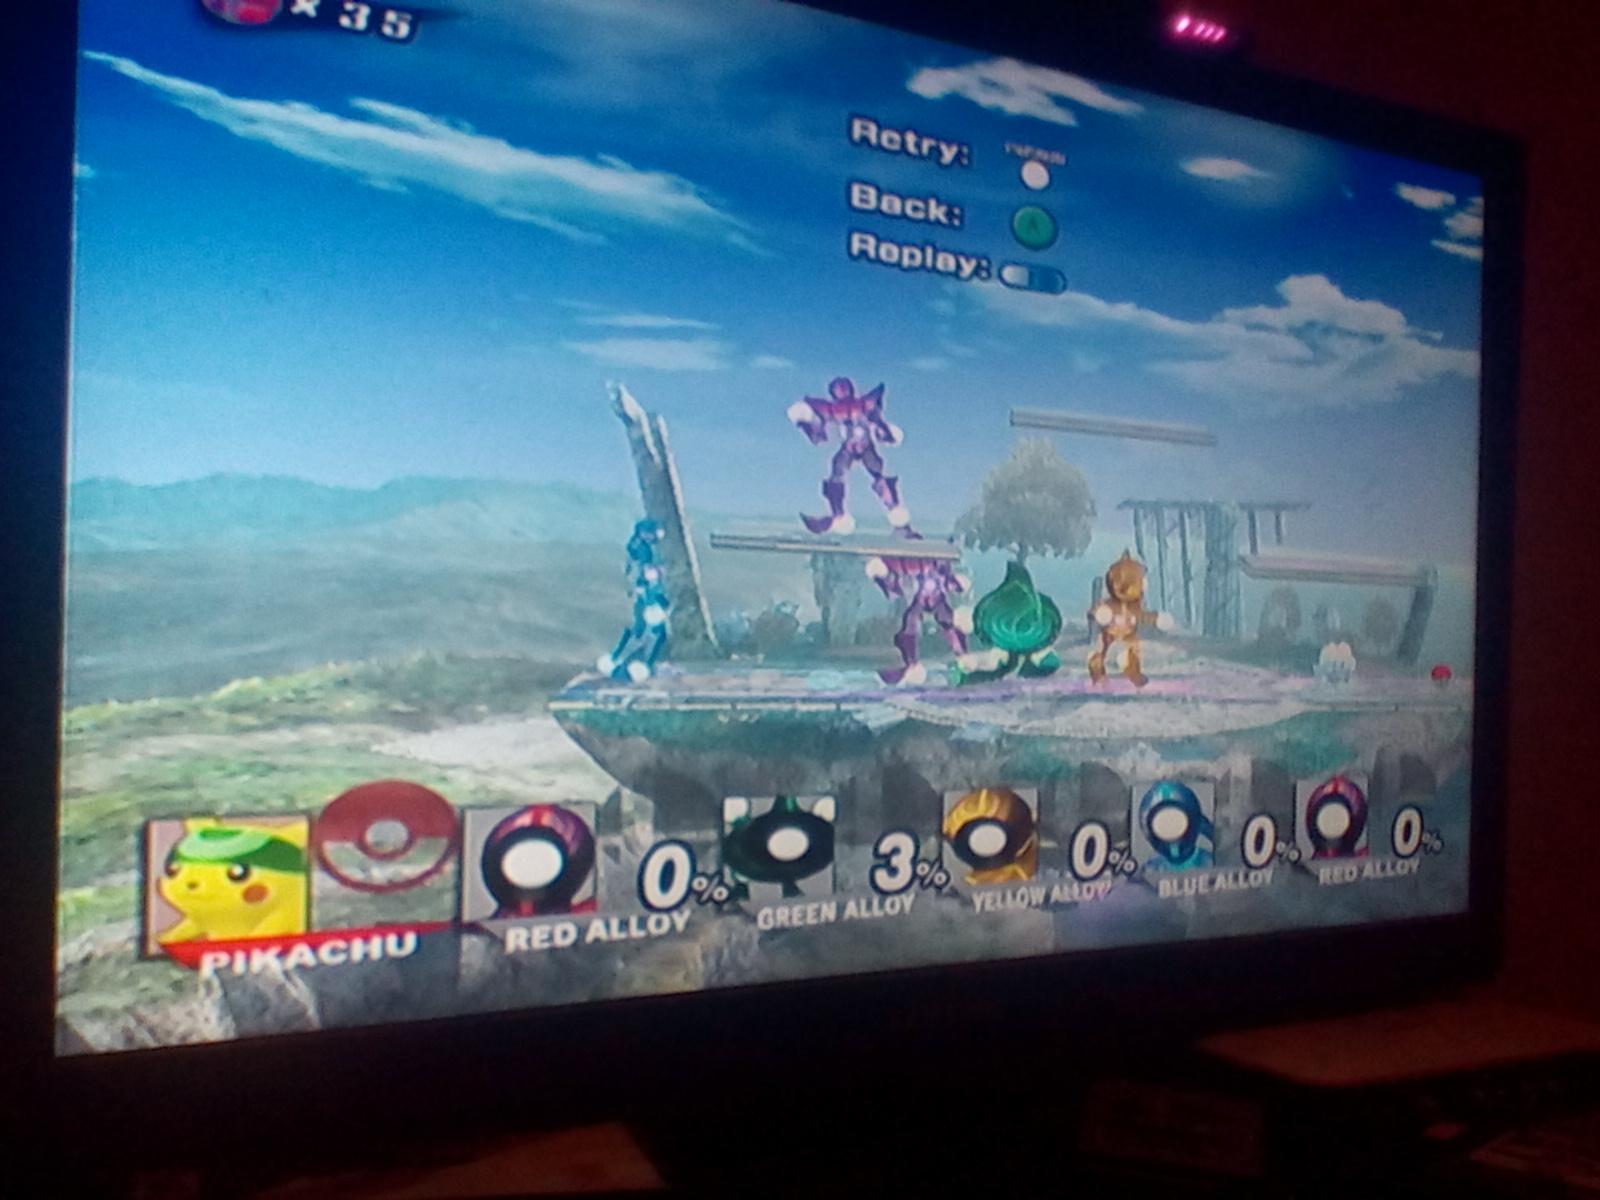 Super Smash Bros. Brawl: Endless Brawl: Pikachu 35 points